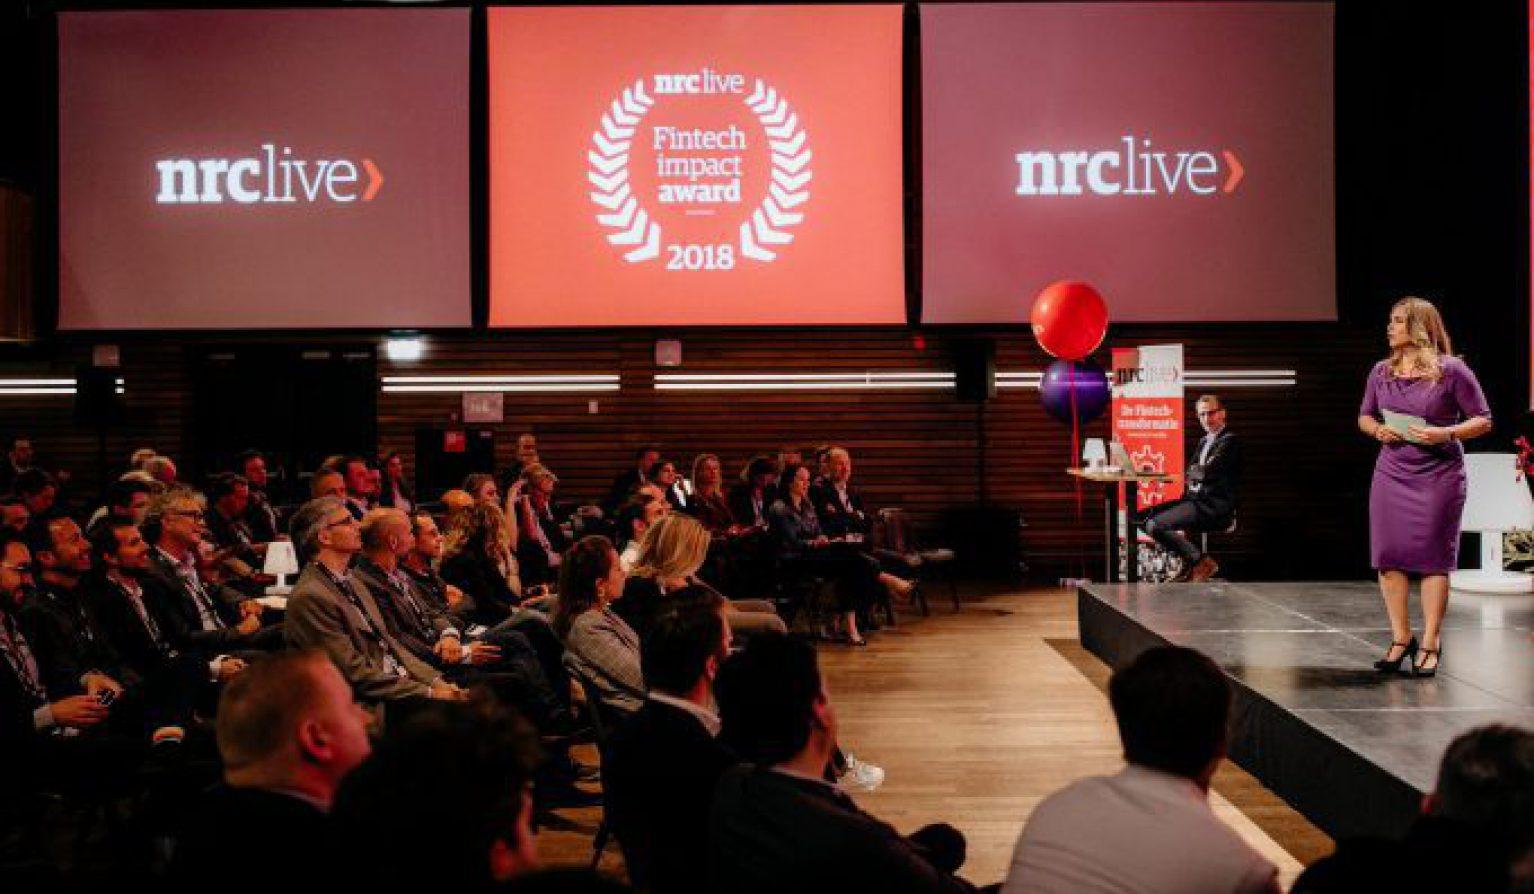 Nrc-live-fintech-impact-awards